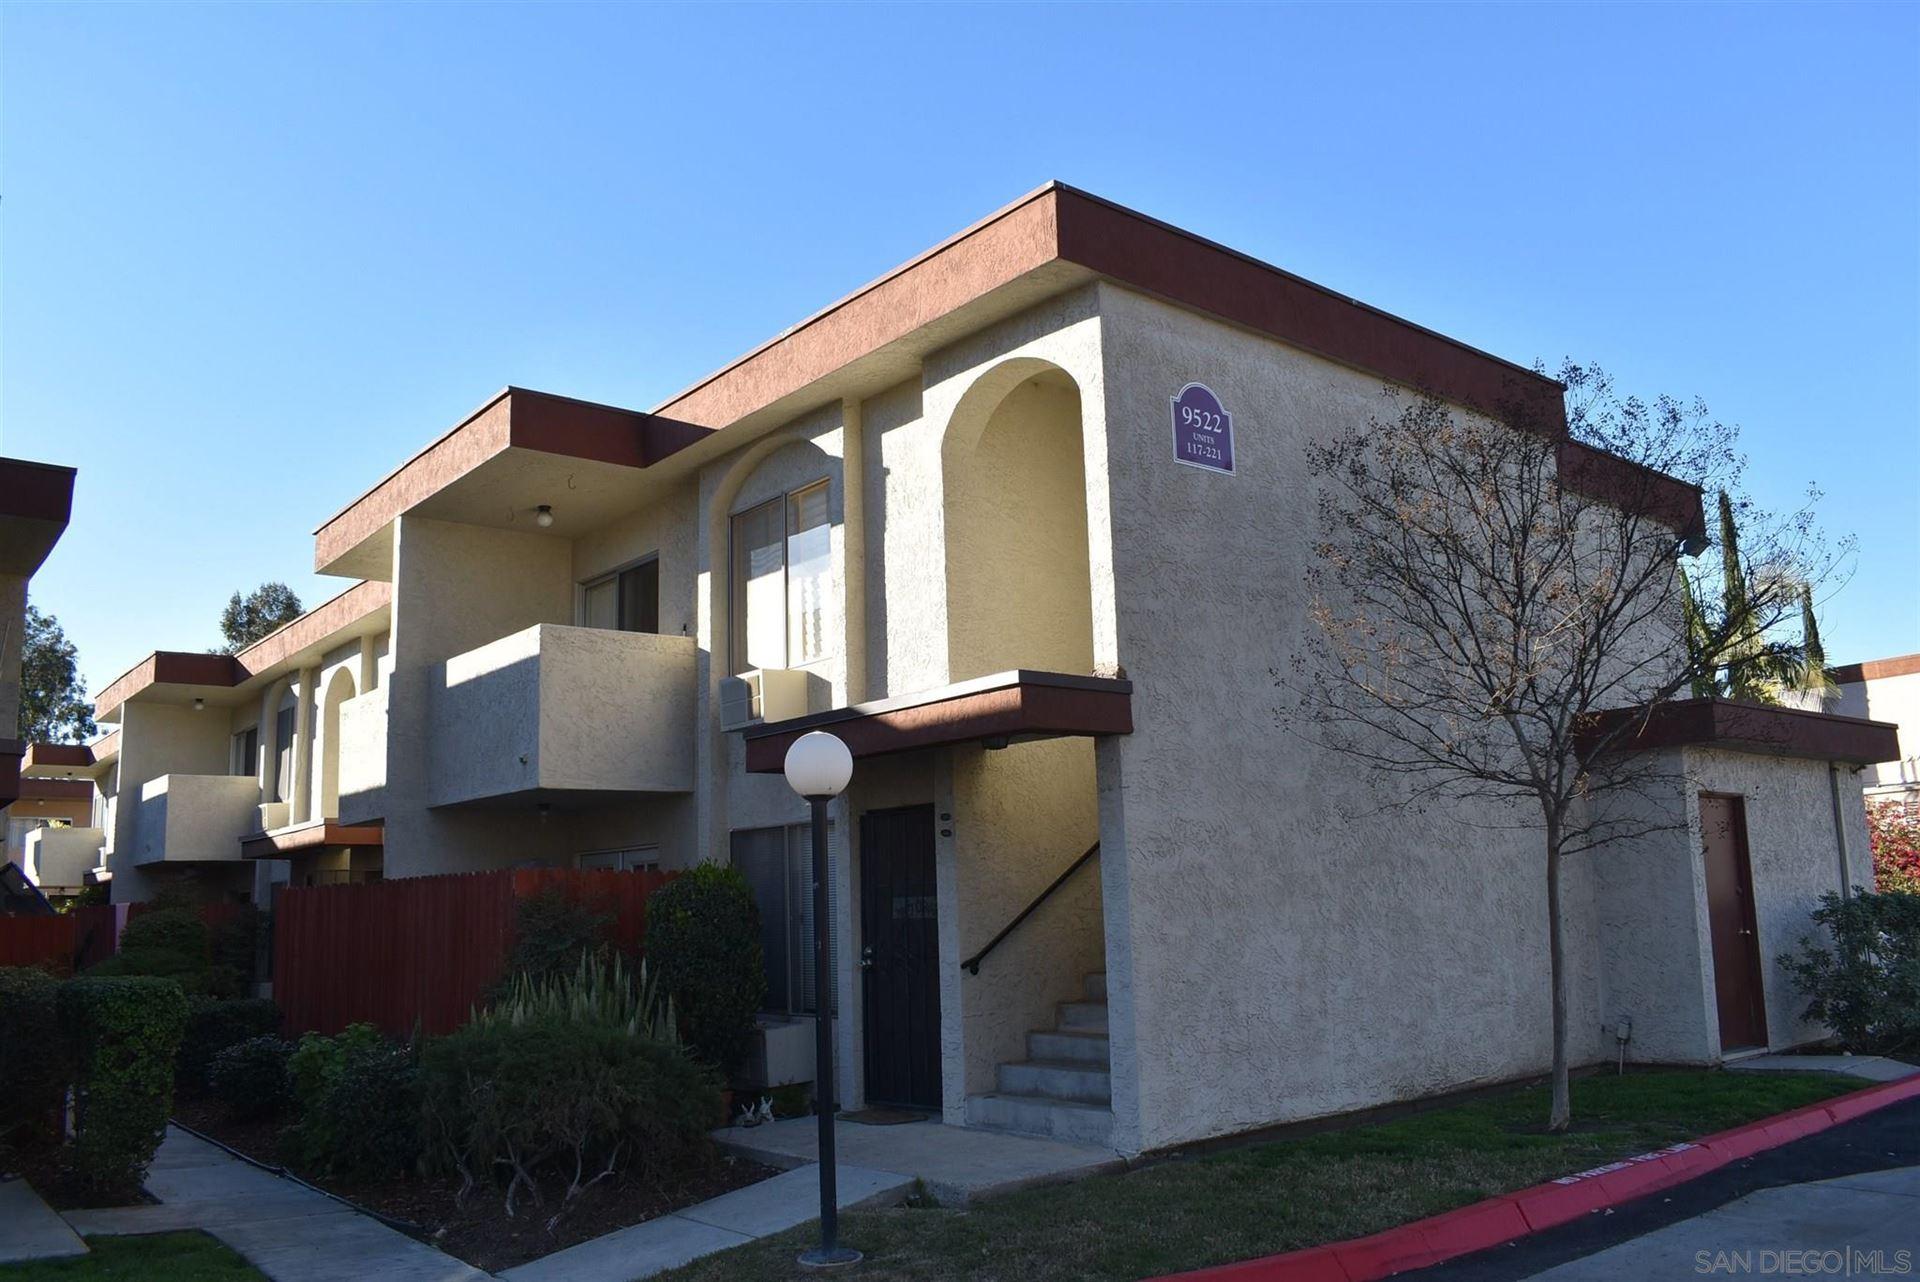 Photo of 9522 Carroll Canyon Rd #120, San Diego, CA 92126 (MLS # 210005783)